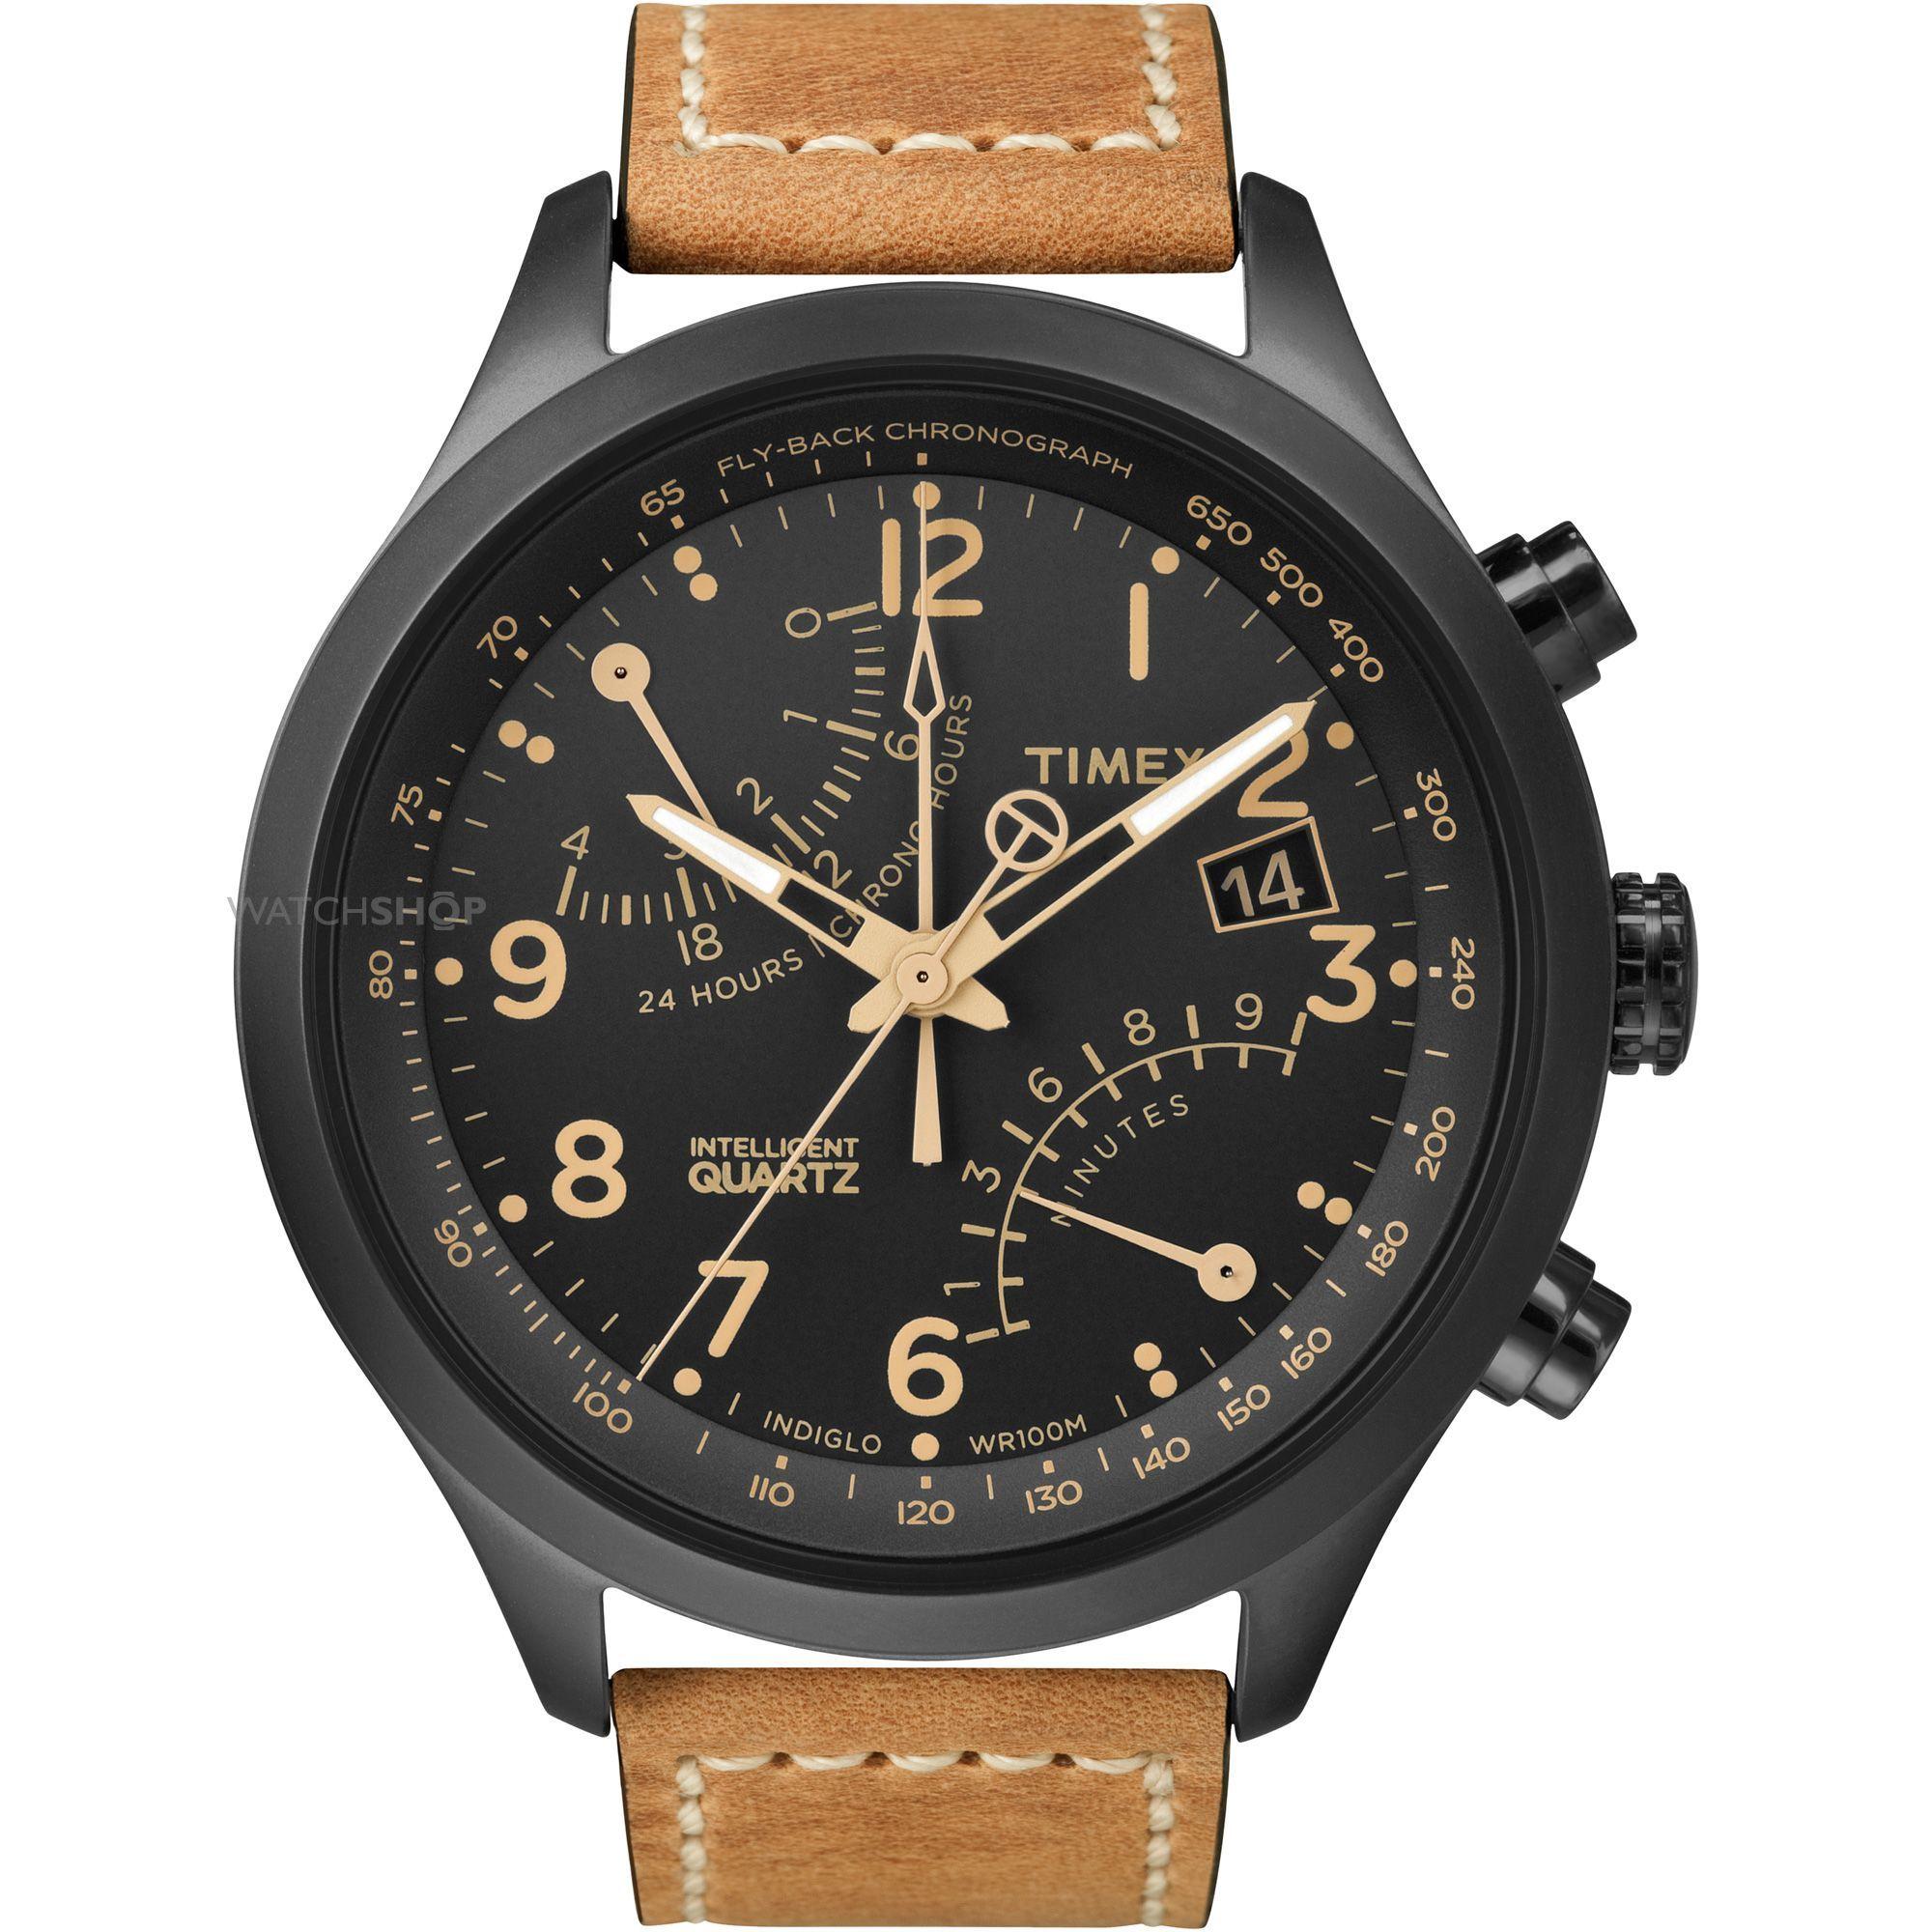 Mens Timex Indiglo Intelligent Quartz Chronograph Watch T2N700